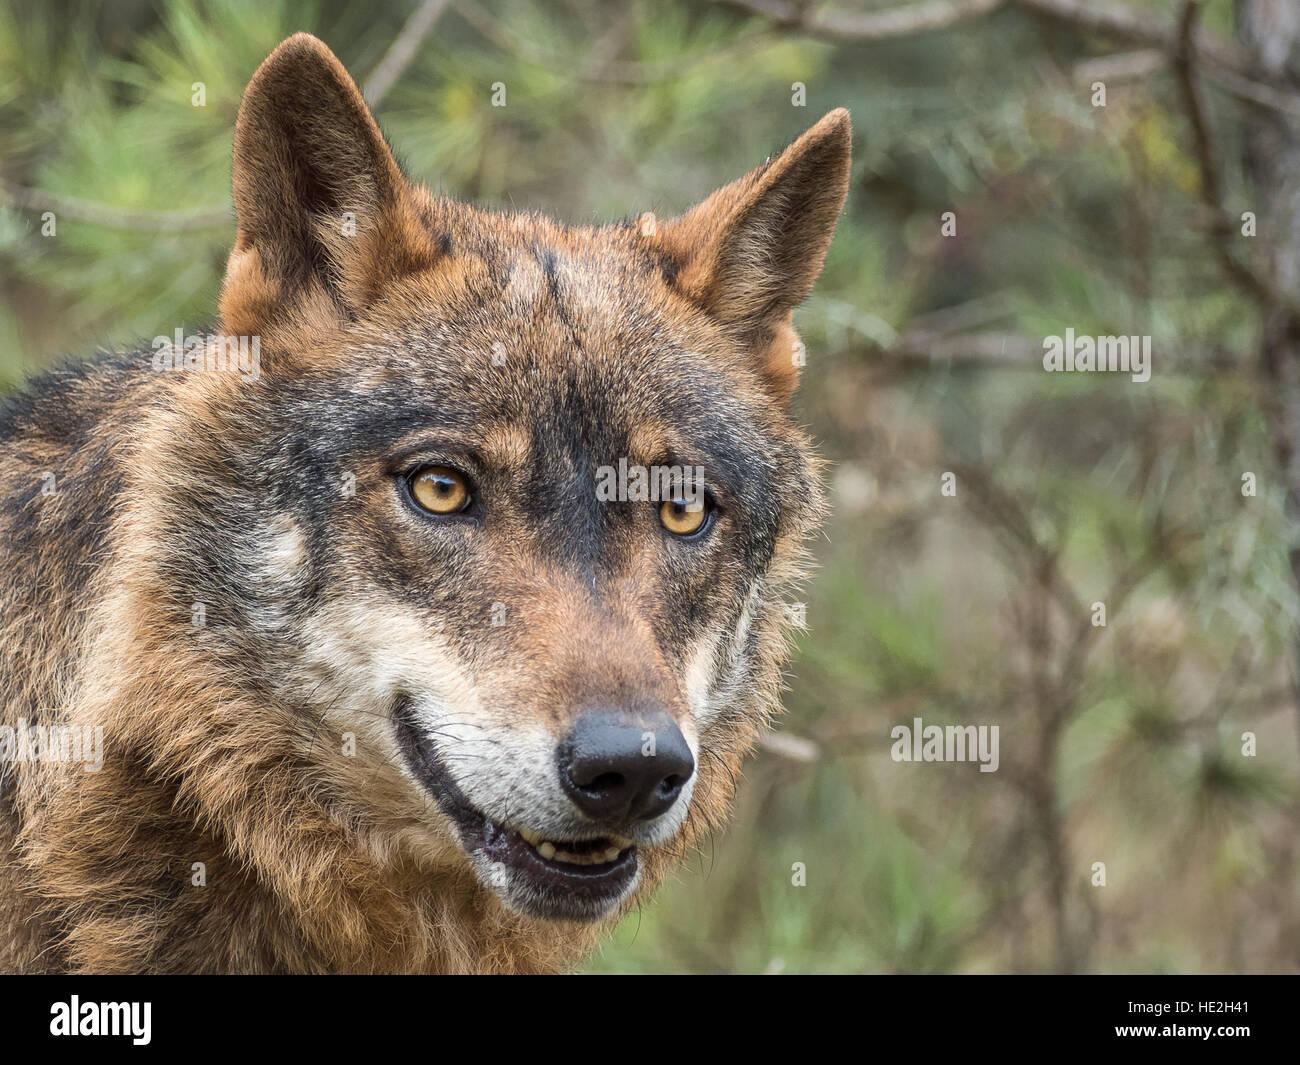 Cute iberian wolf portrait (Canis lupus signatus) with beautiful eyes - Stock Image